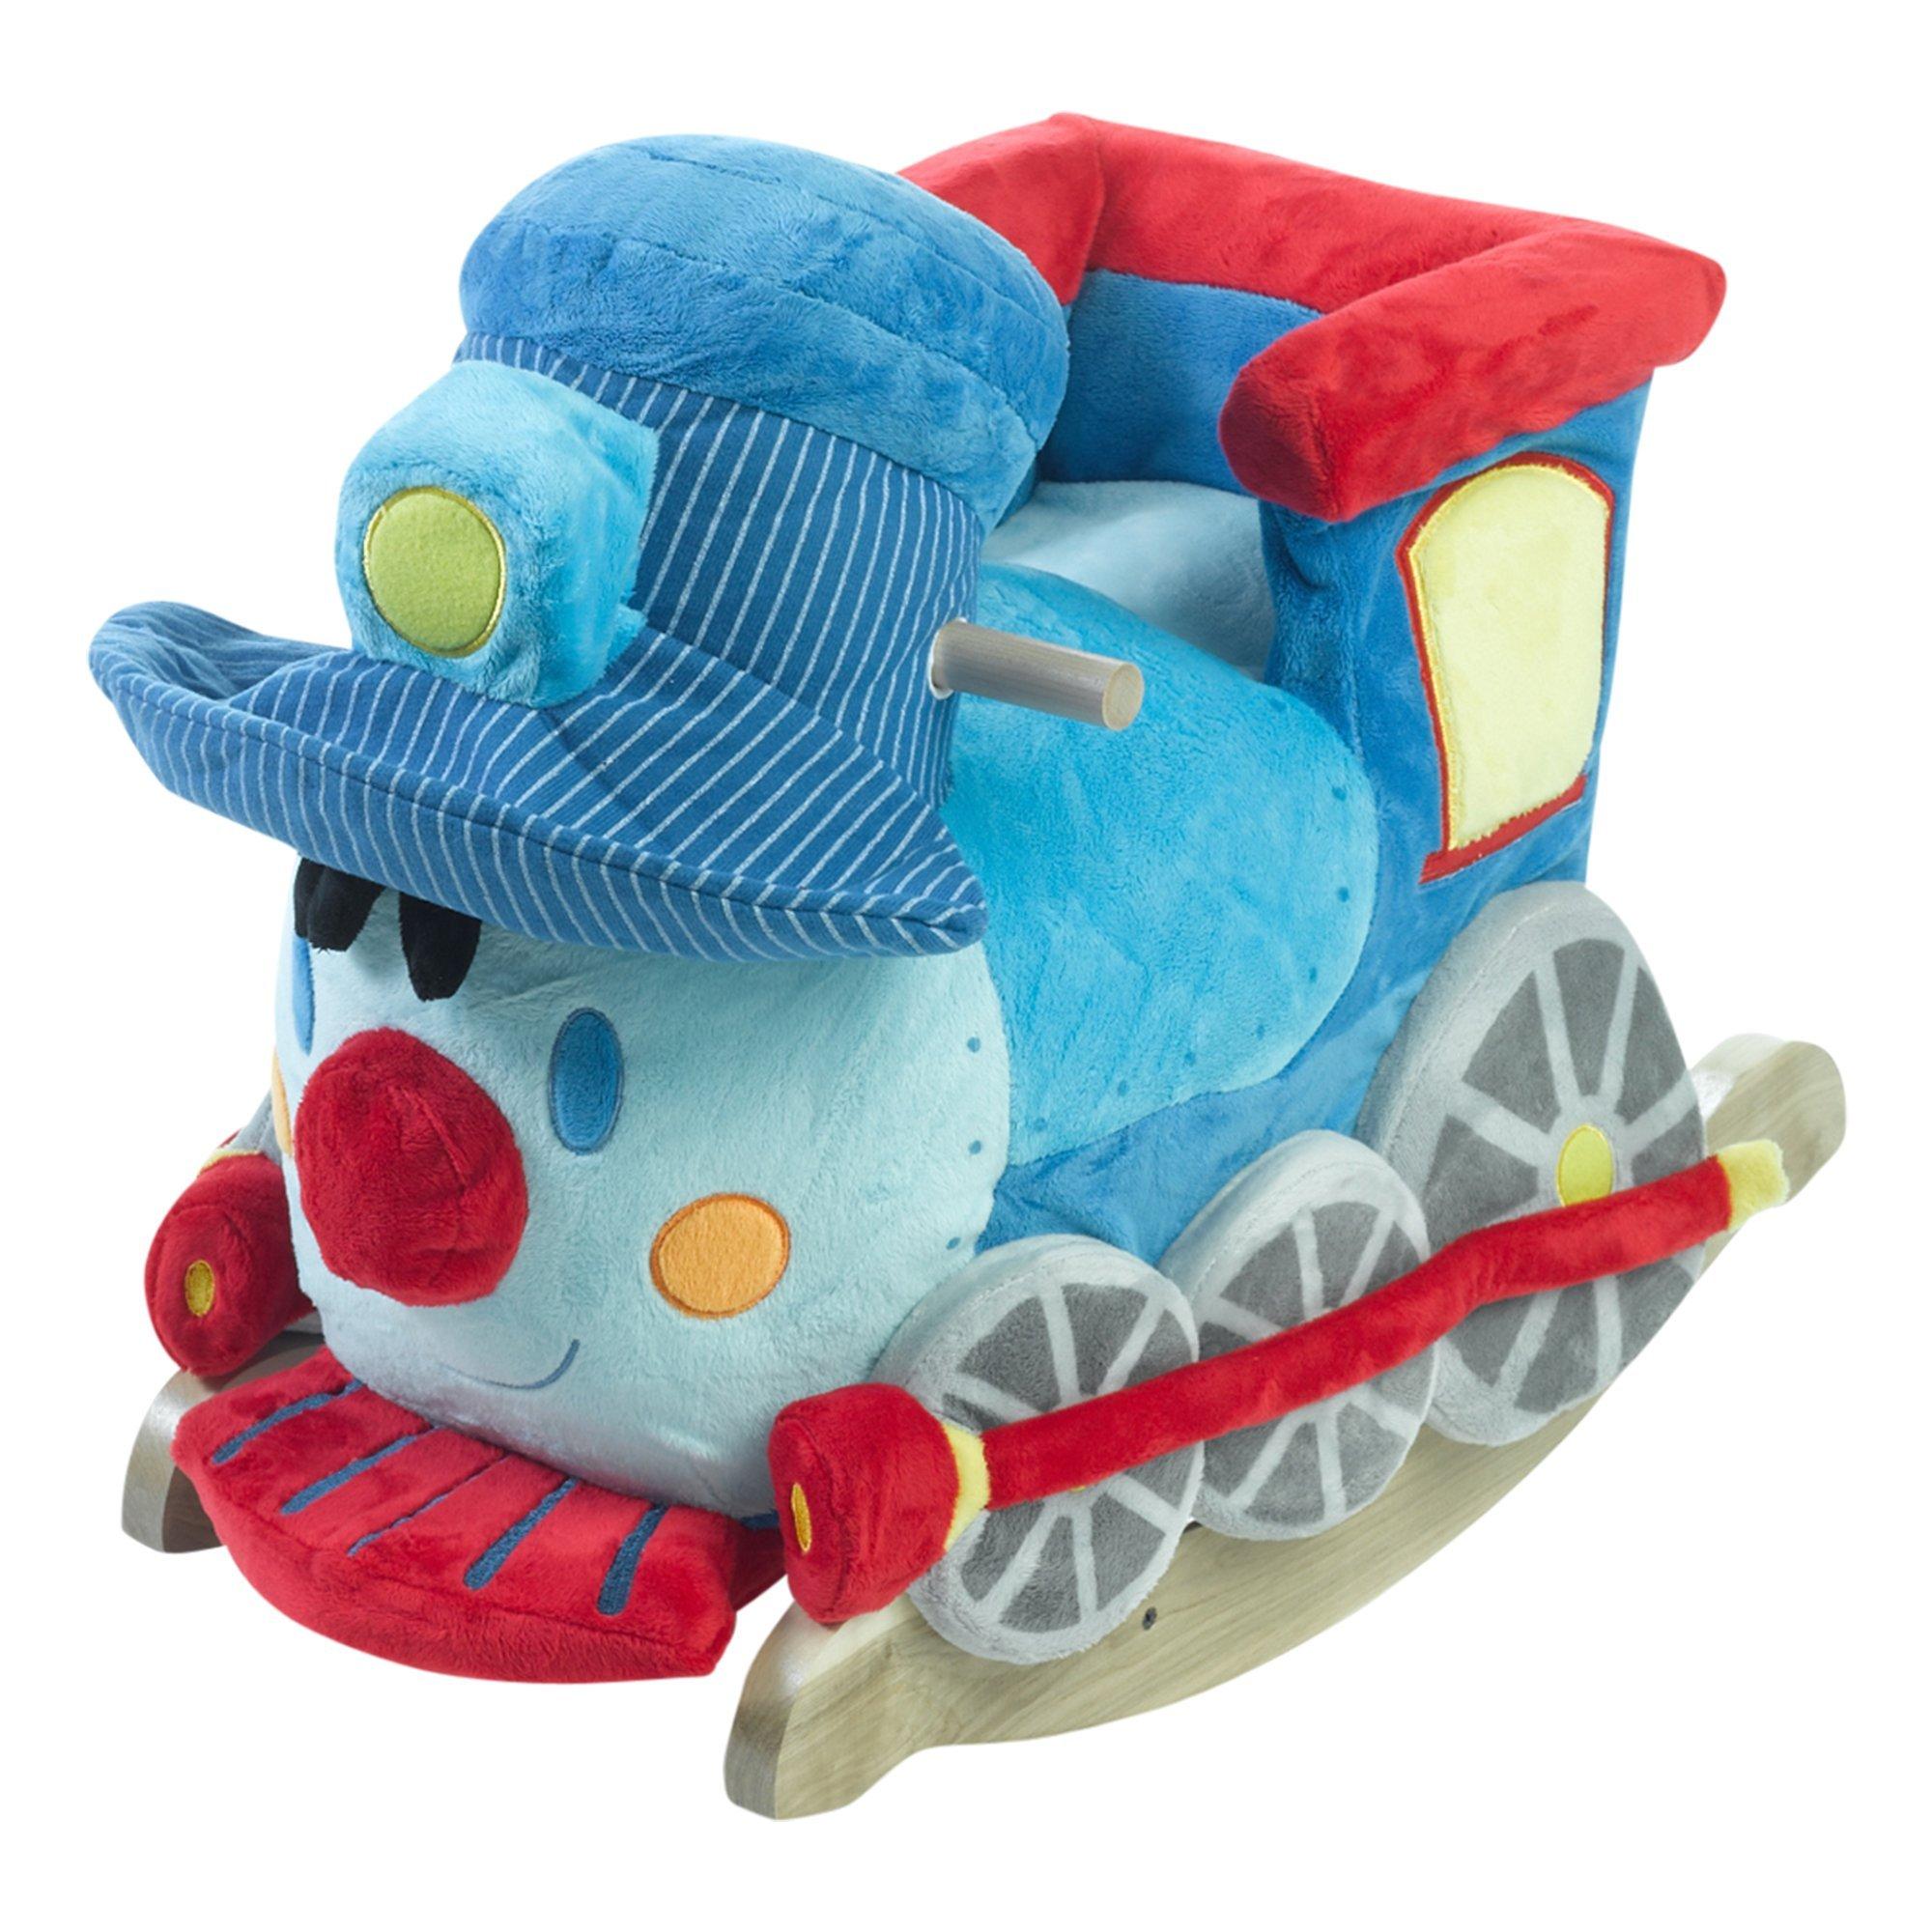 Rockabye Trax the Train Rocker, One Size